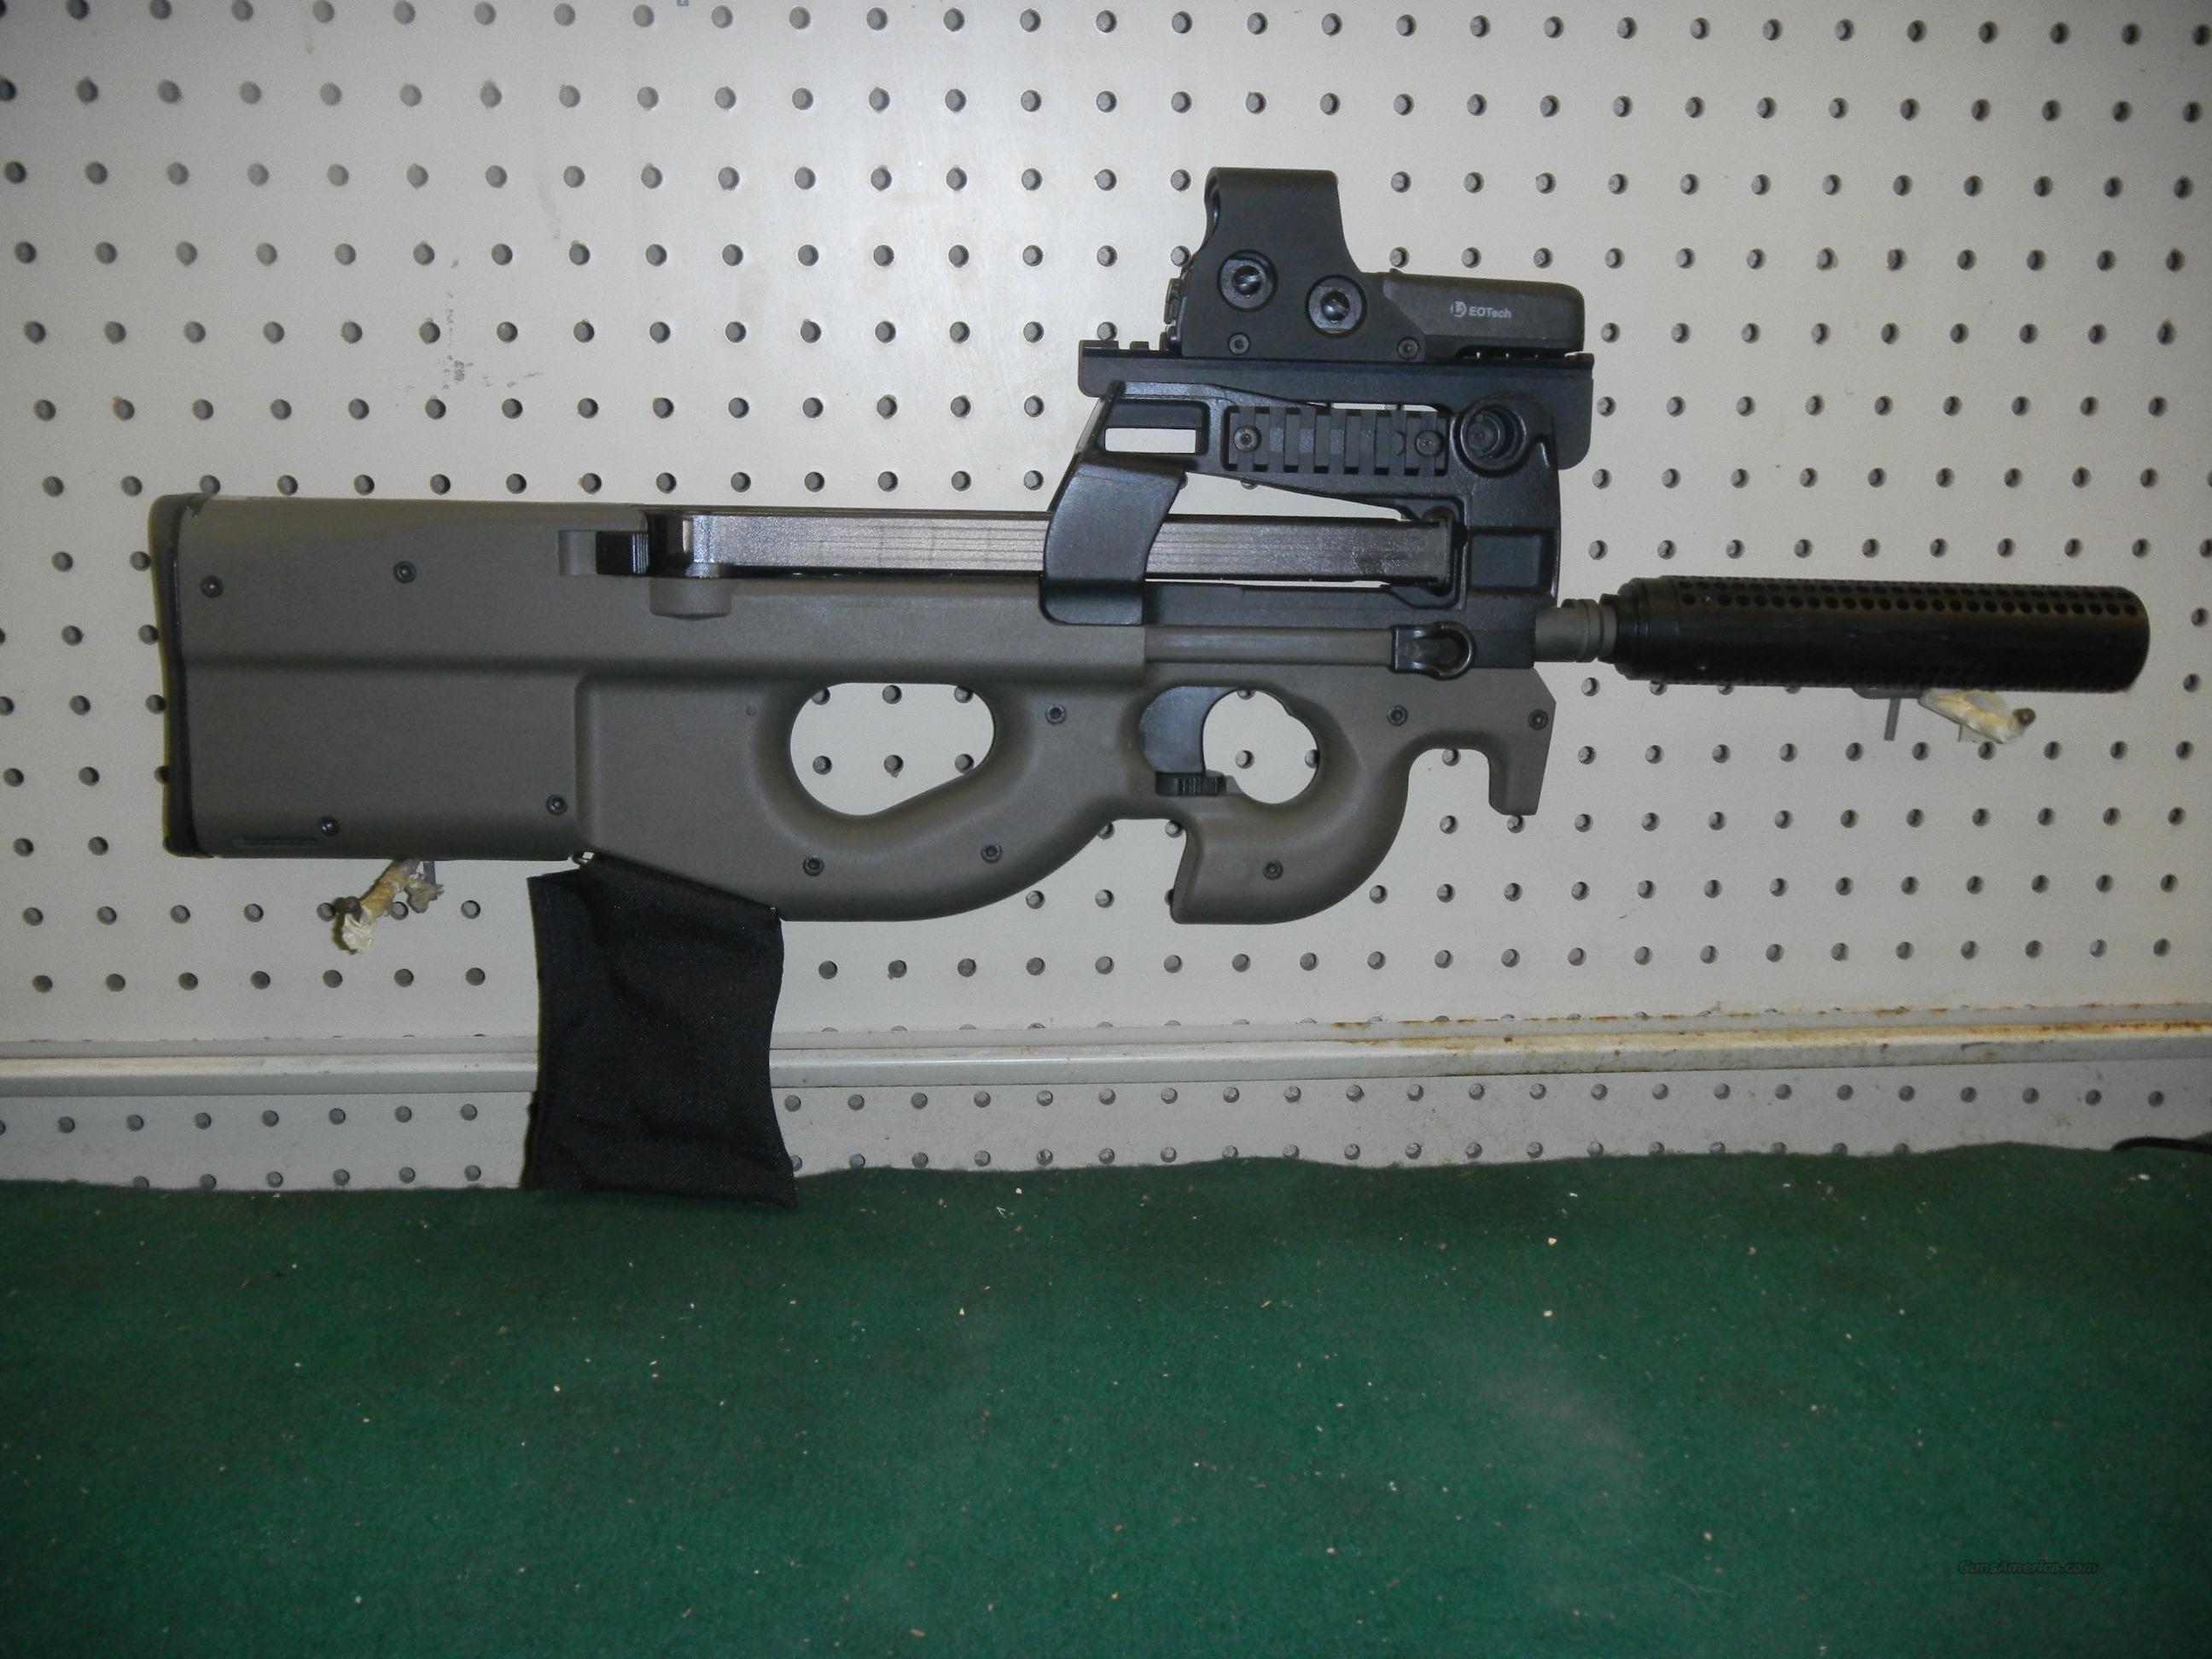 FNH PS() combat rifle  Guns > Rifles > FNH - Fabrique Nationale (FN) Rifles > Semi-auto > PS90